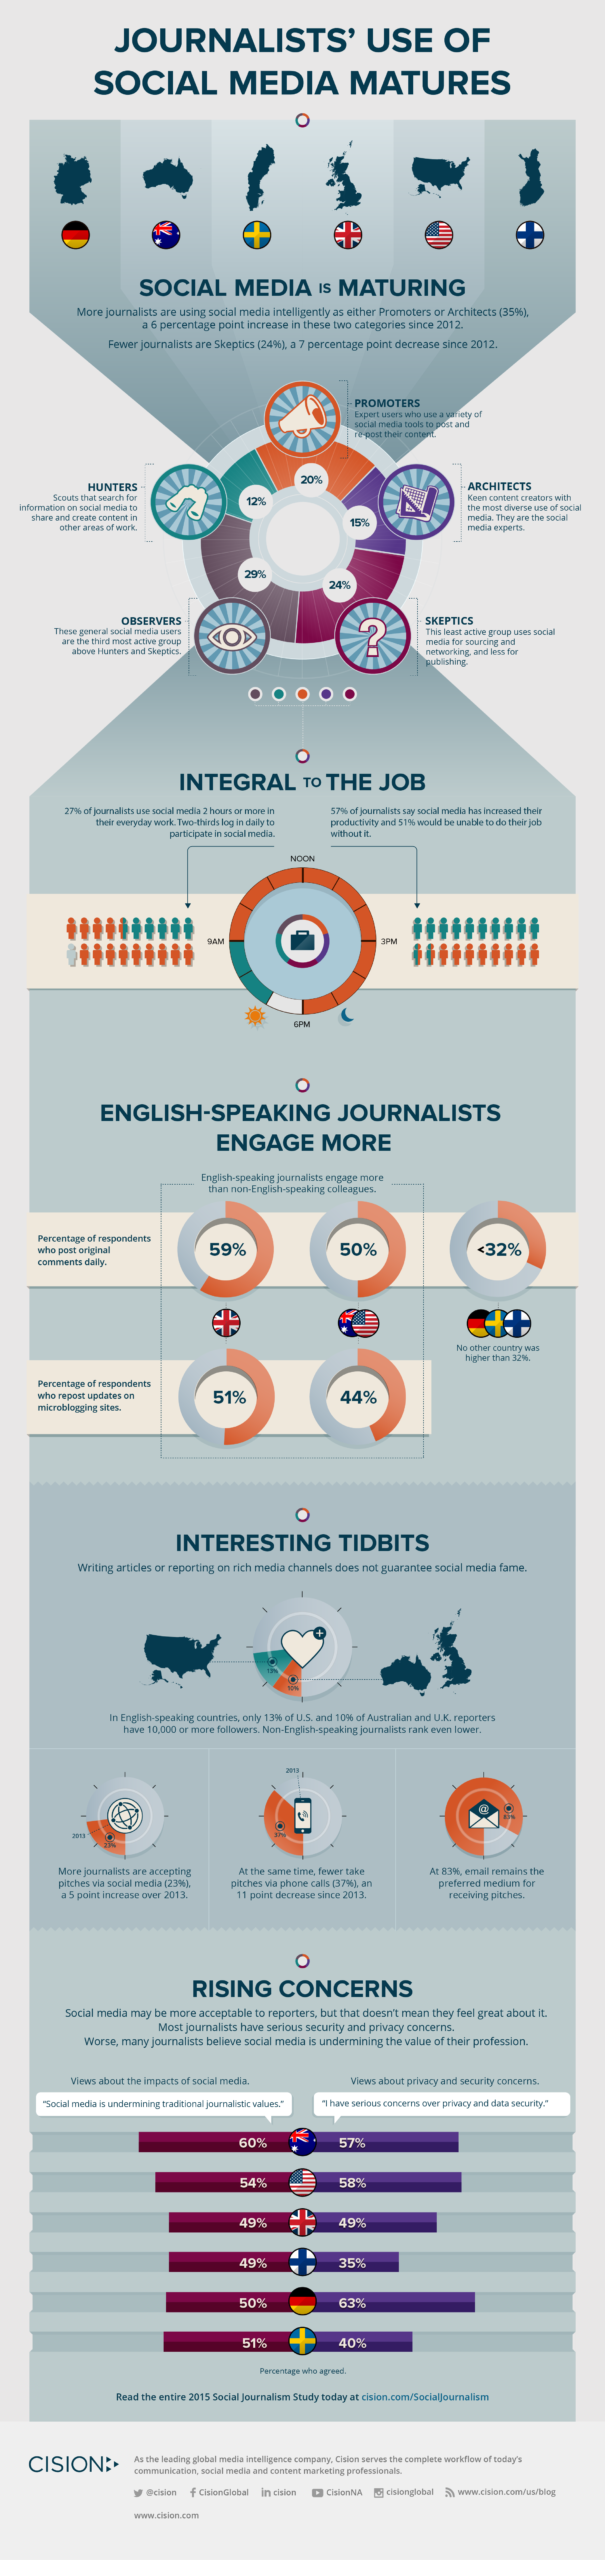 Study reveals social media is undermining journalistic values